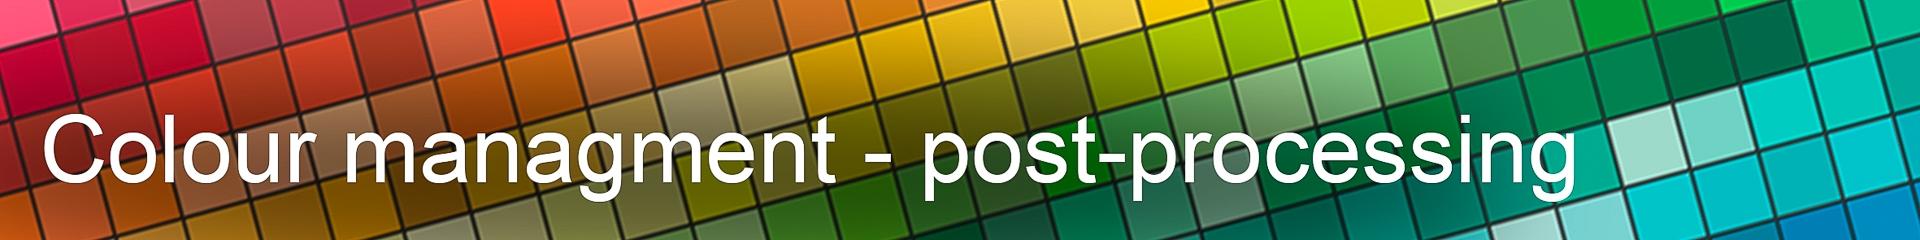 Img - 01 - Post